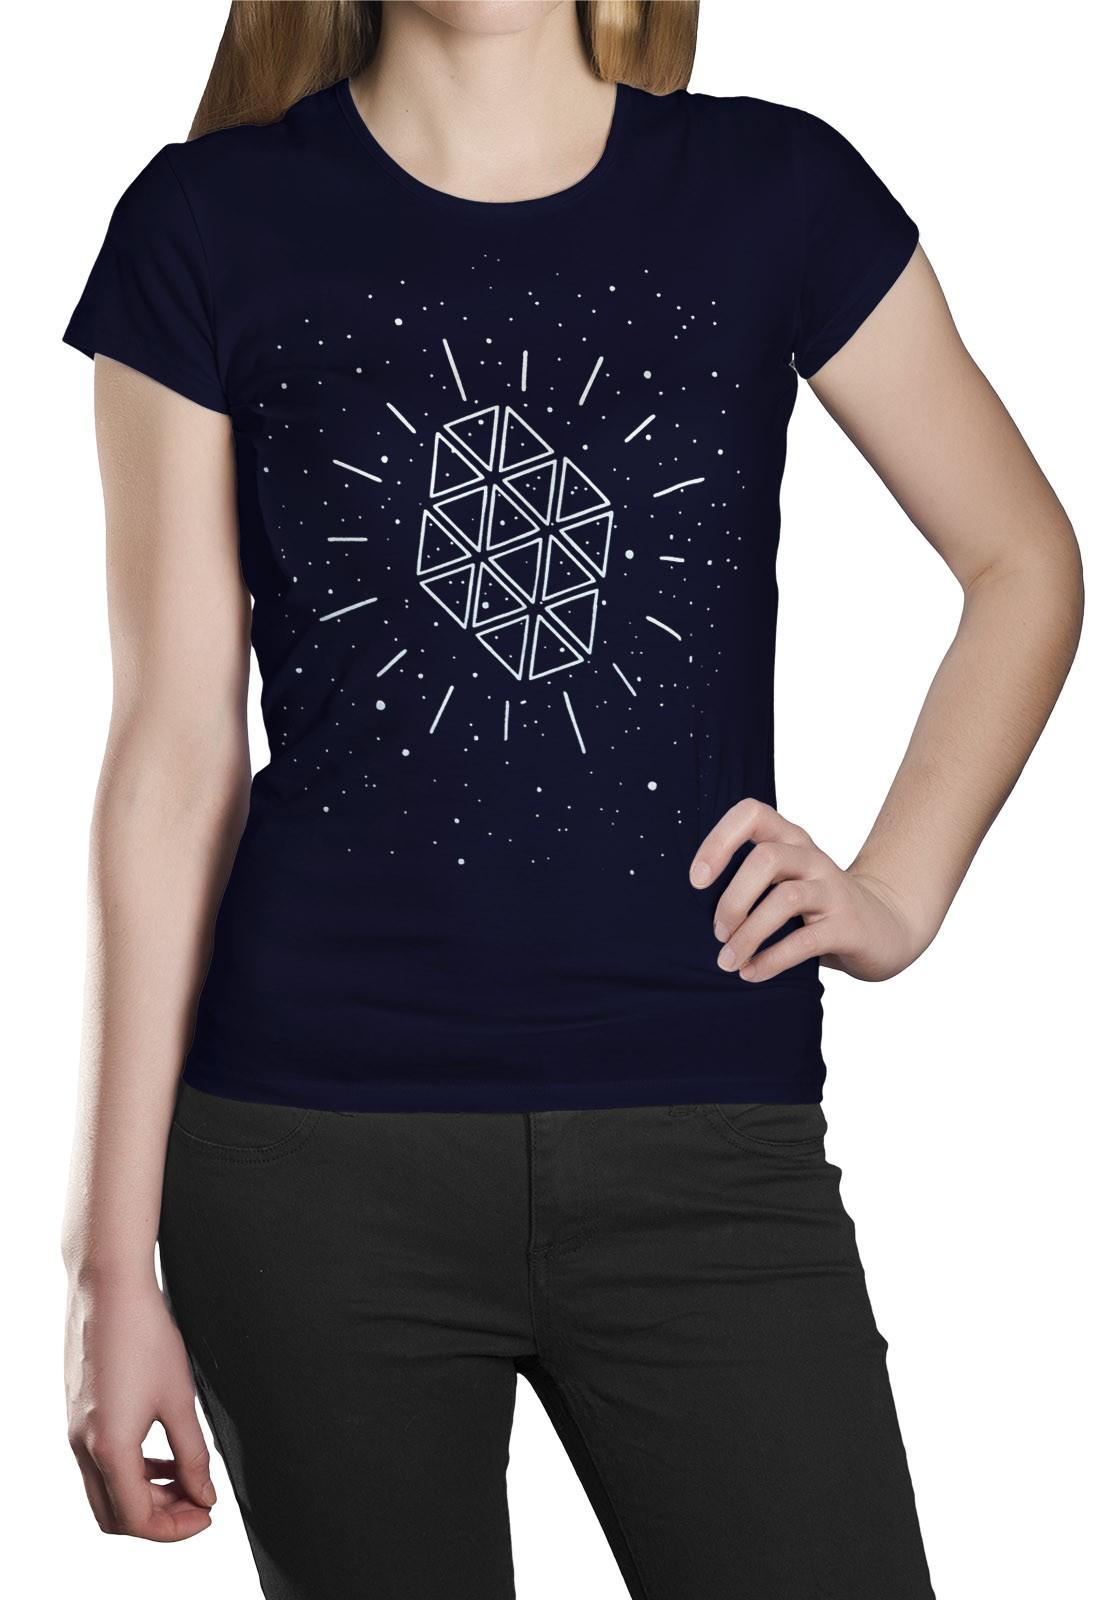 Camiseta HShop Galaxia Azul Marinho  - HShop